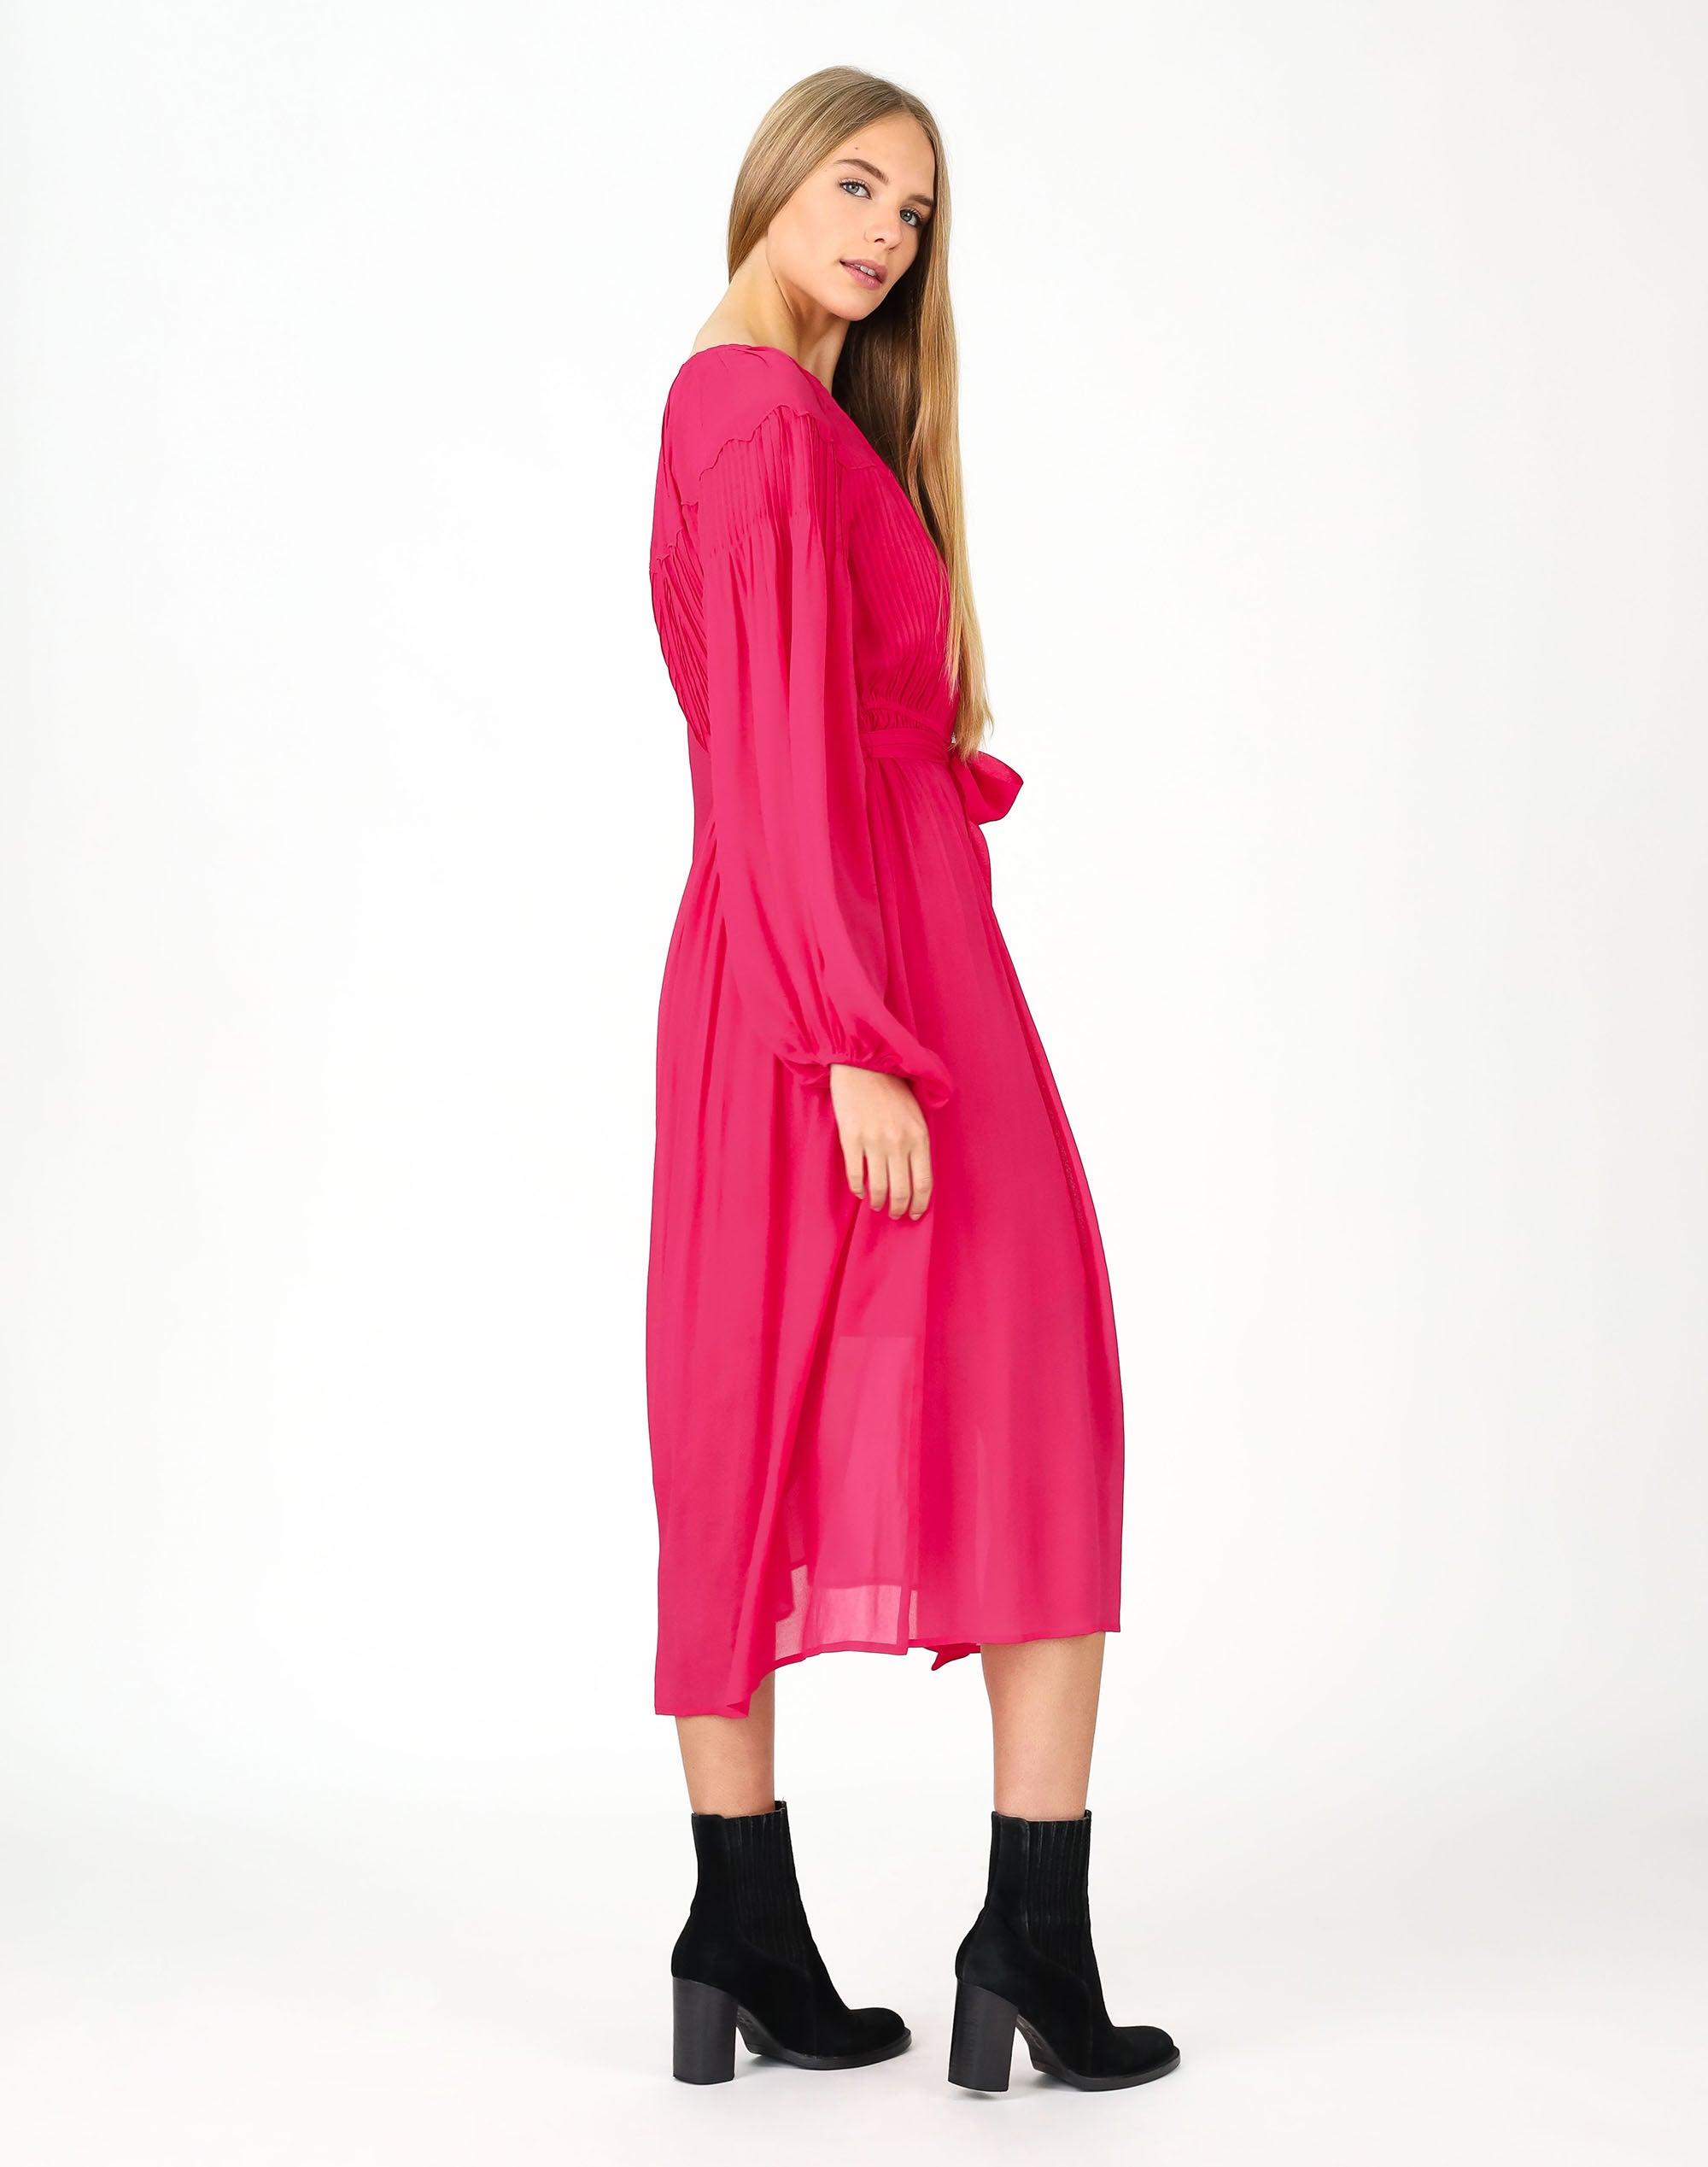 Parisia Pintuck Midi Dress